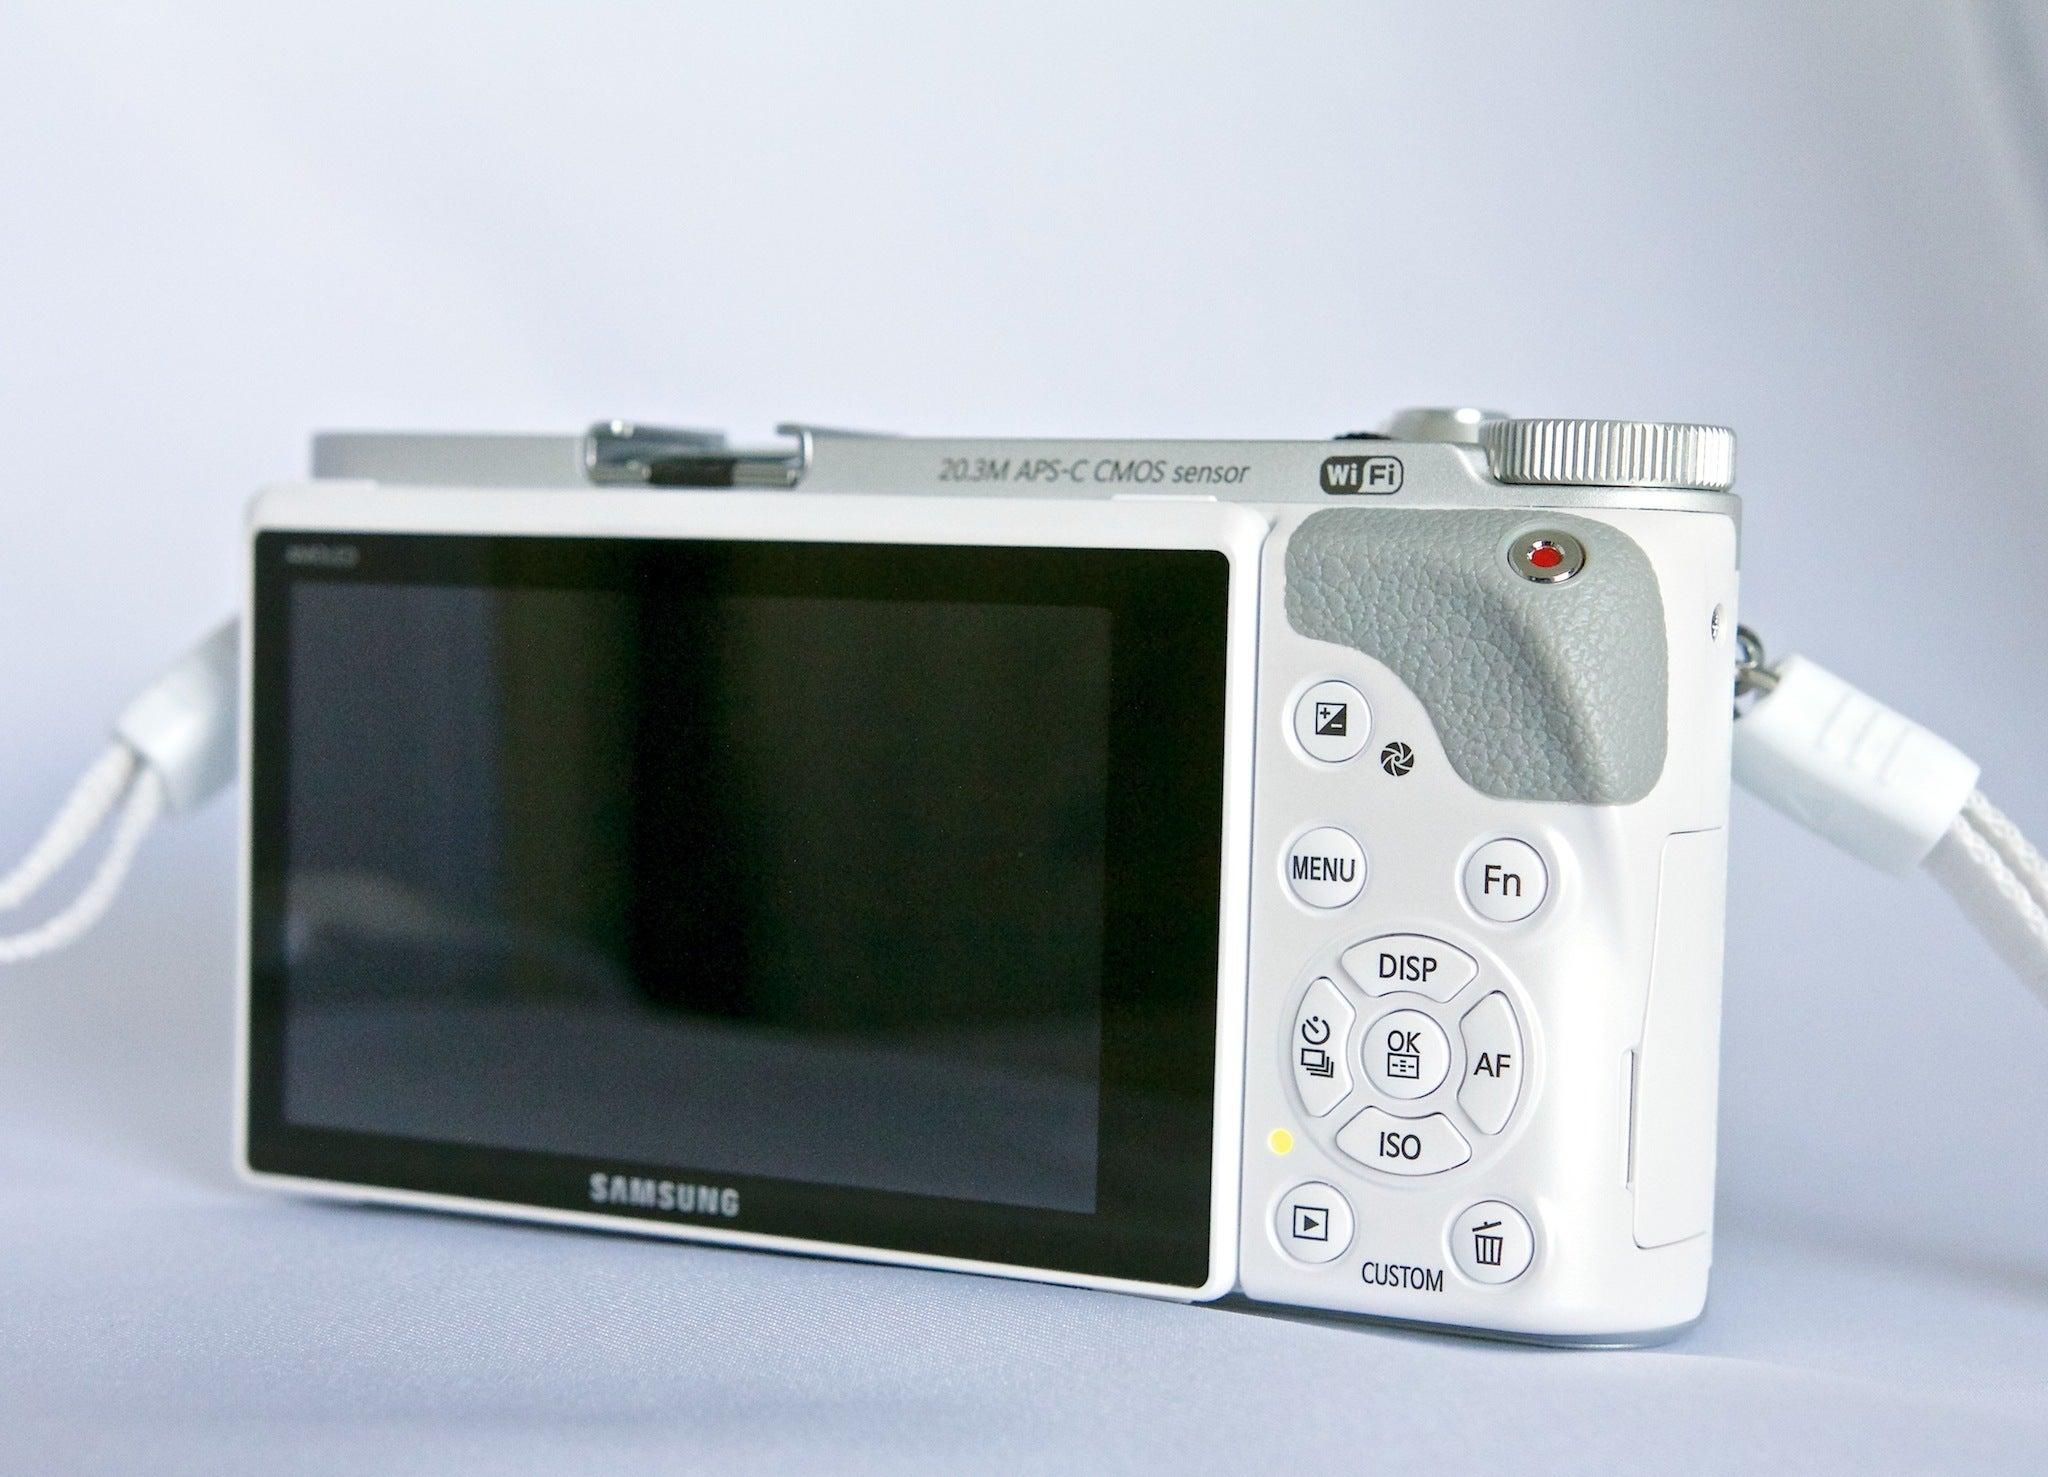 samsung nx300 review shoot like a pro share like a teenager techhive rh techhive com samsung m300 manual samsung nx300 manual